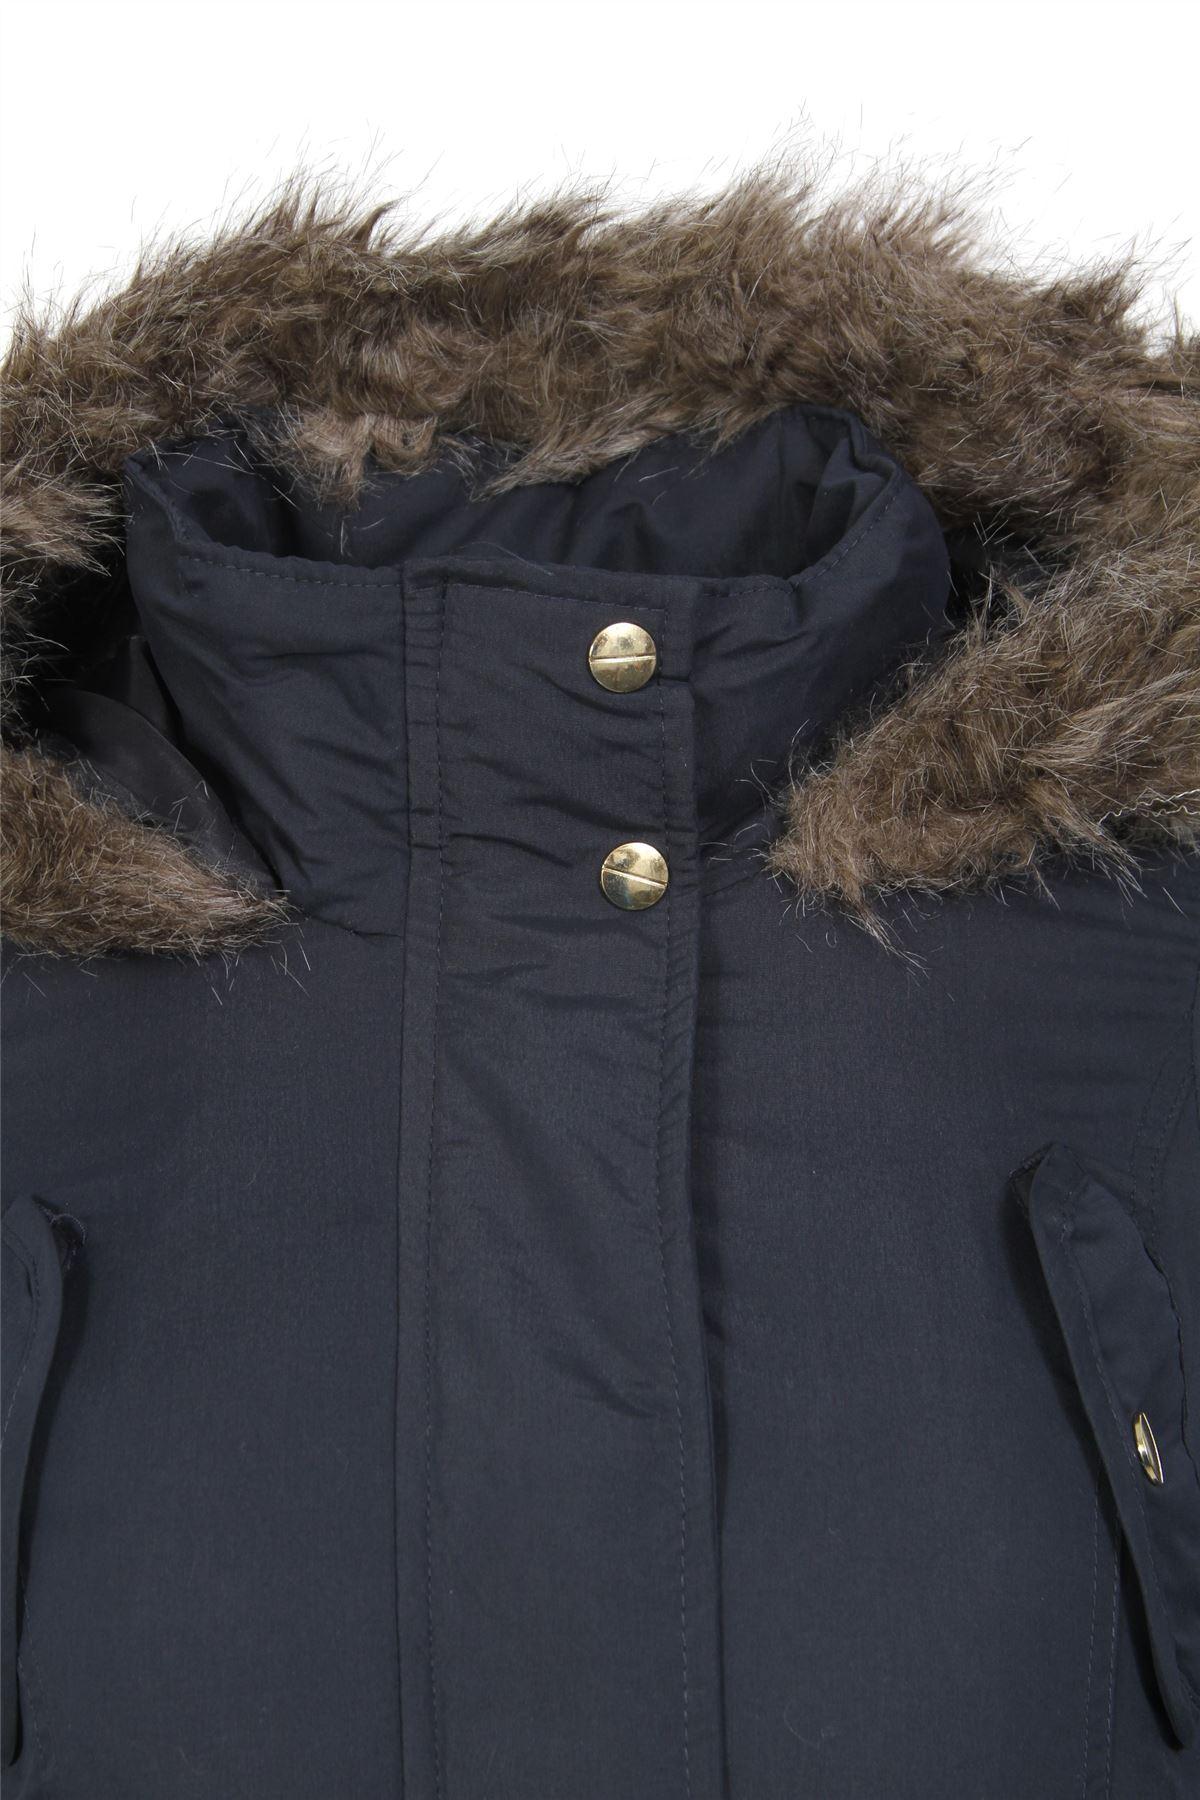 Womens-Brave-Soul-Plain-Trimmed-Parka-Faux-Fur-Hooded-Winter-Jacket-Long-Coat thumbnail 7